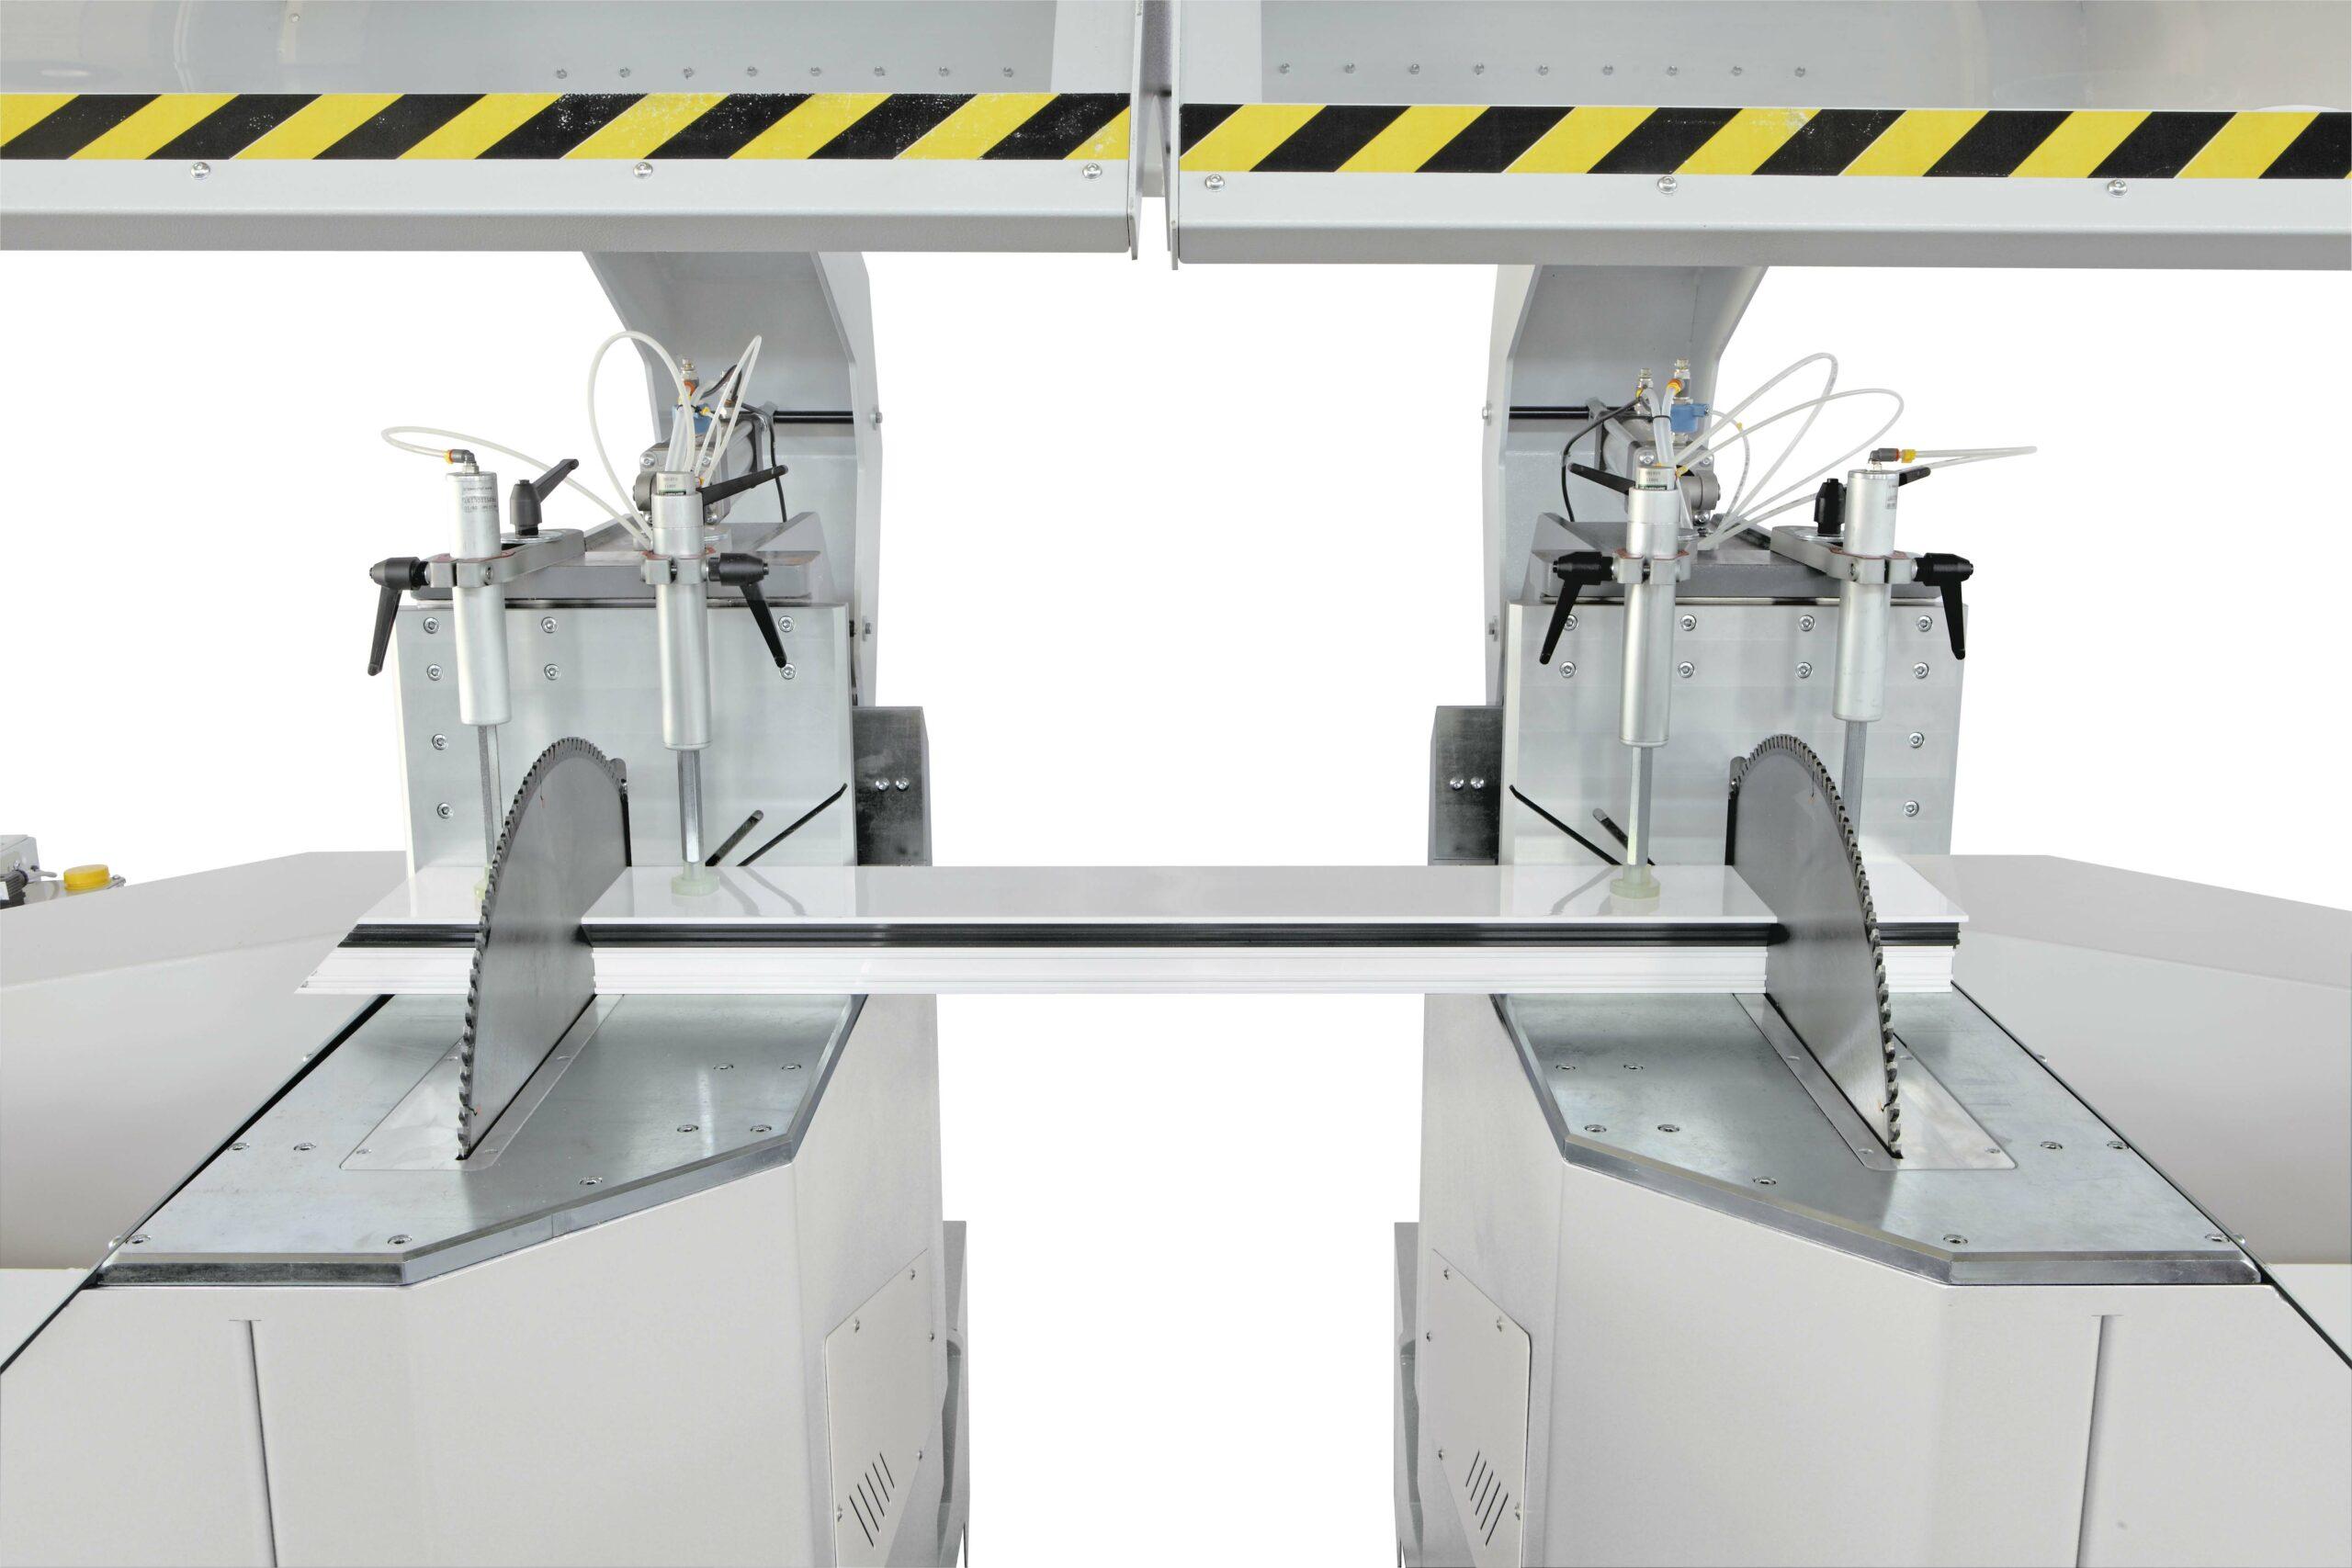 Selecta 1 scaled - Piła dwugłowicowa CNC Gemma SELECTA 3